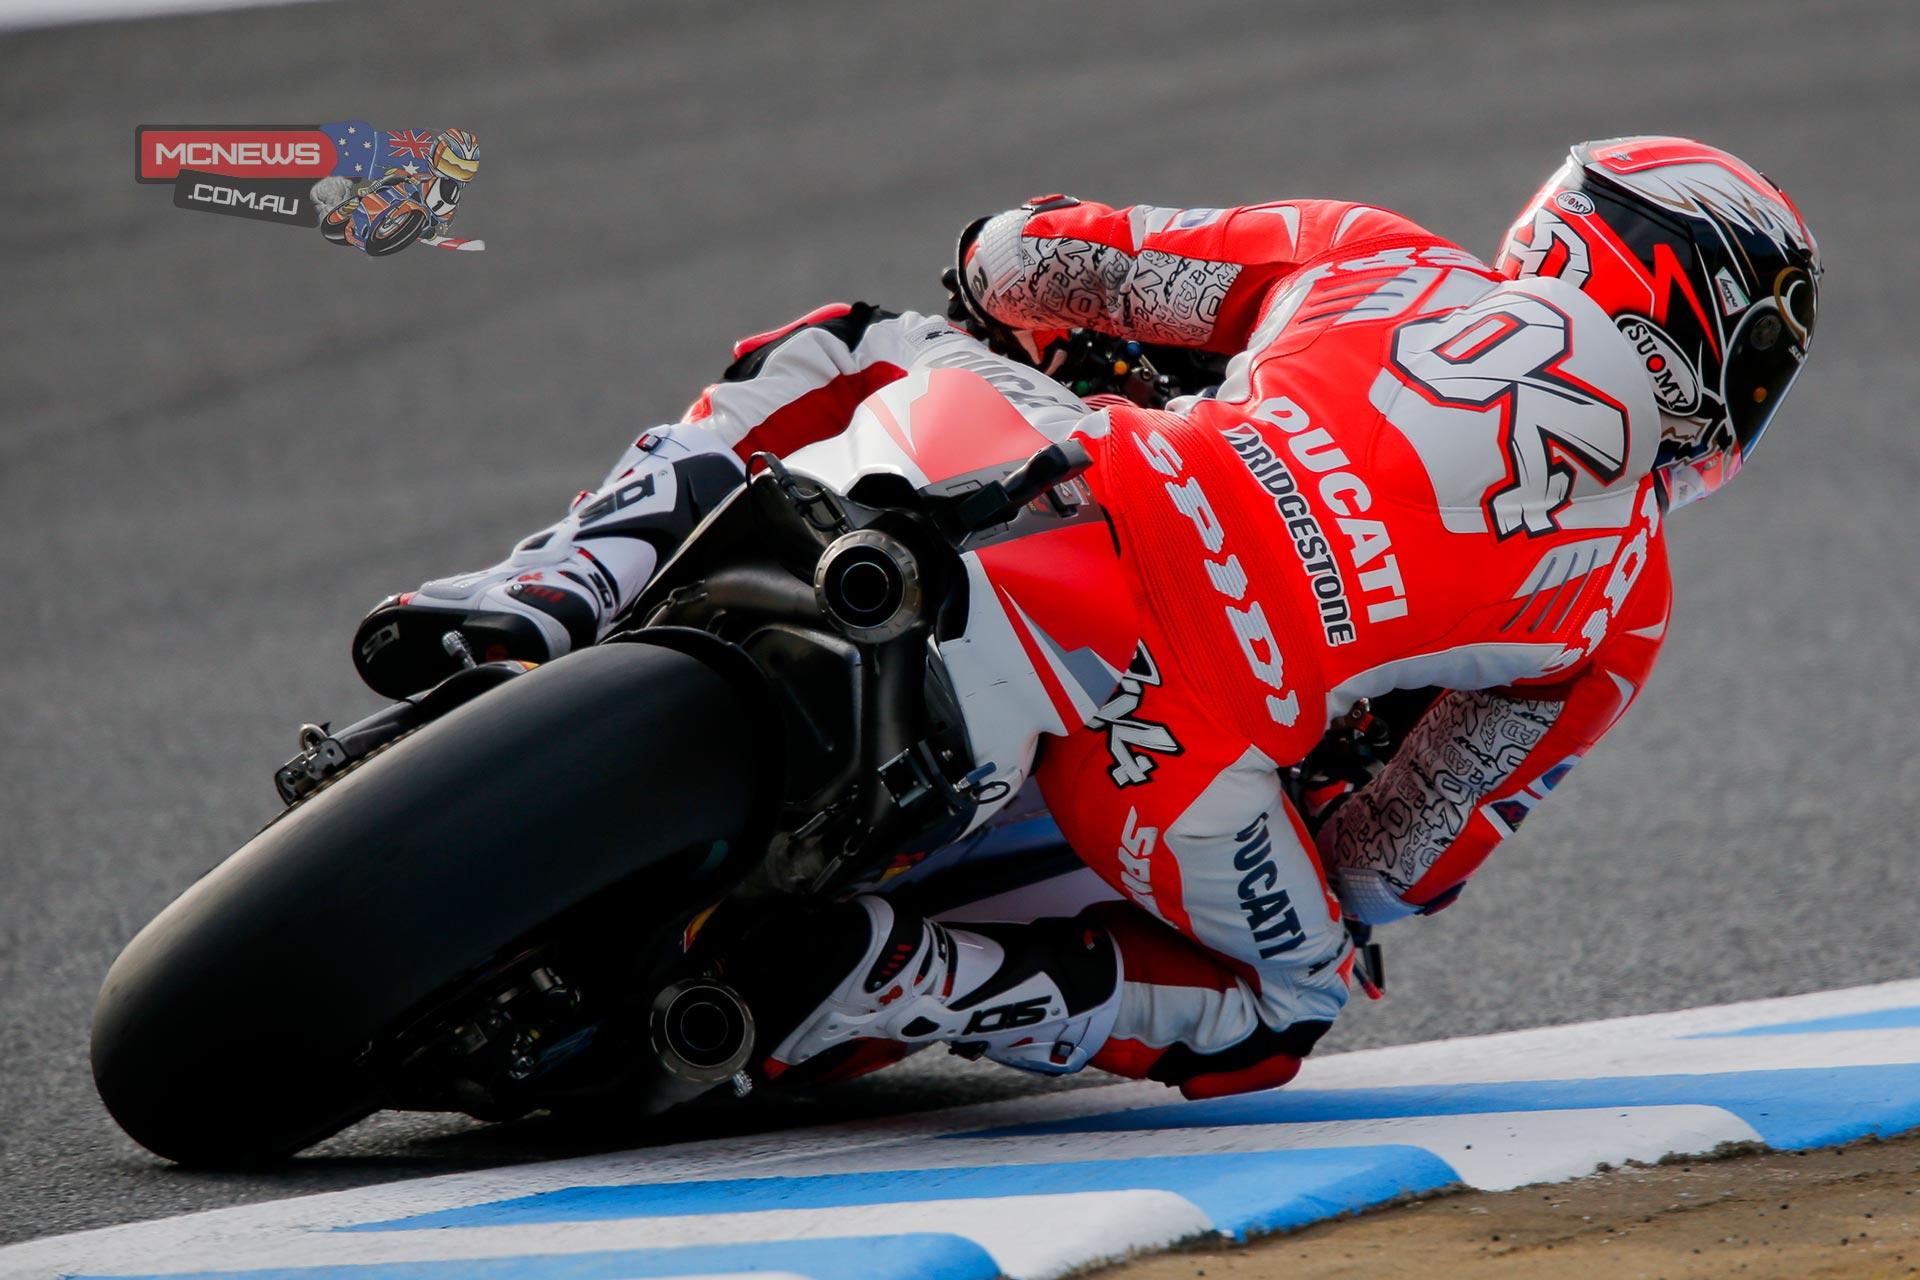 Dovizioso tops Motegi MotoGP day one | MCNews.com.au